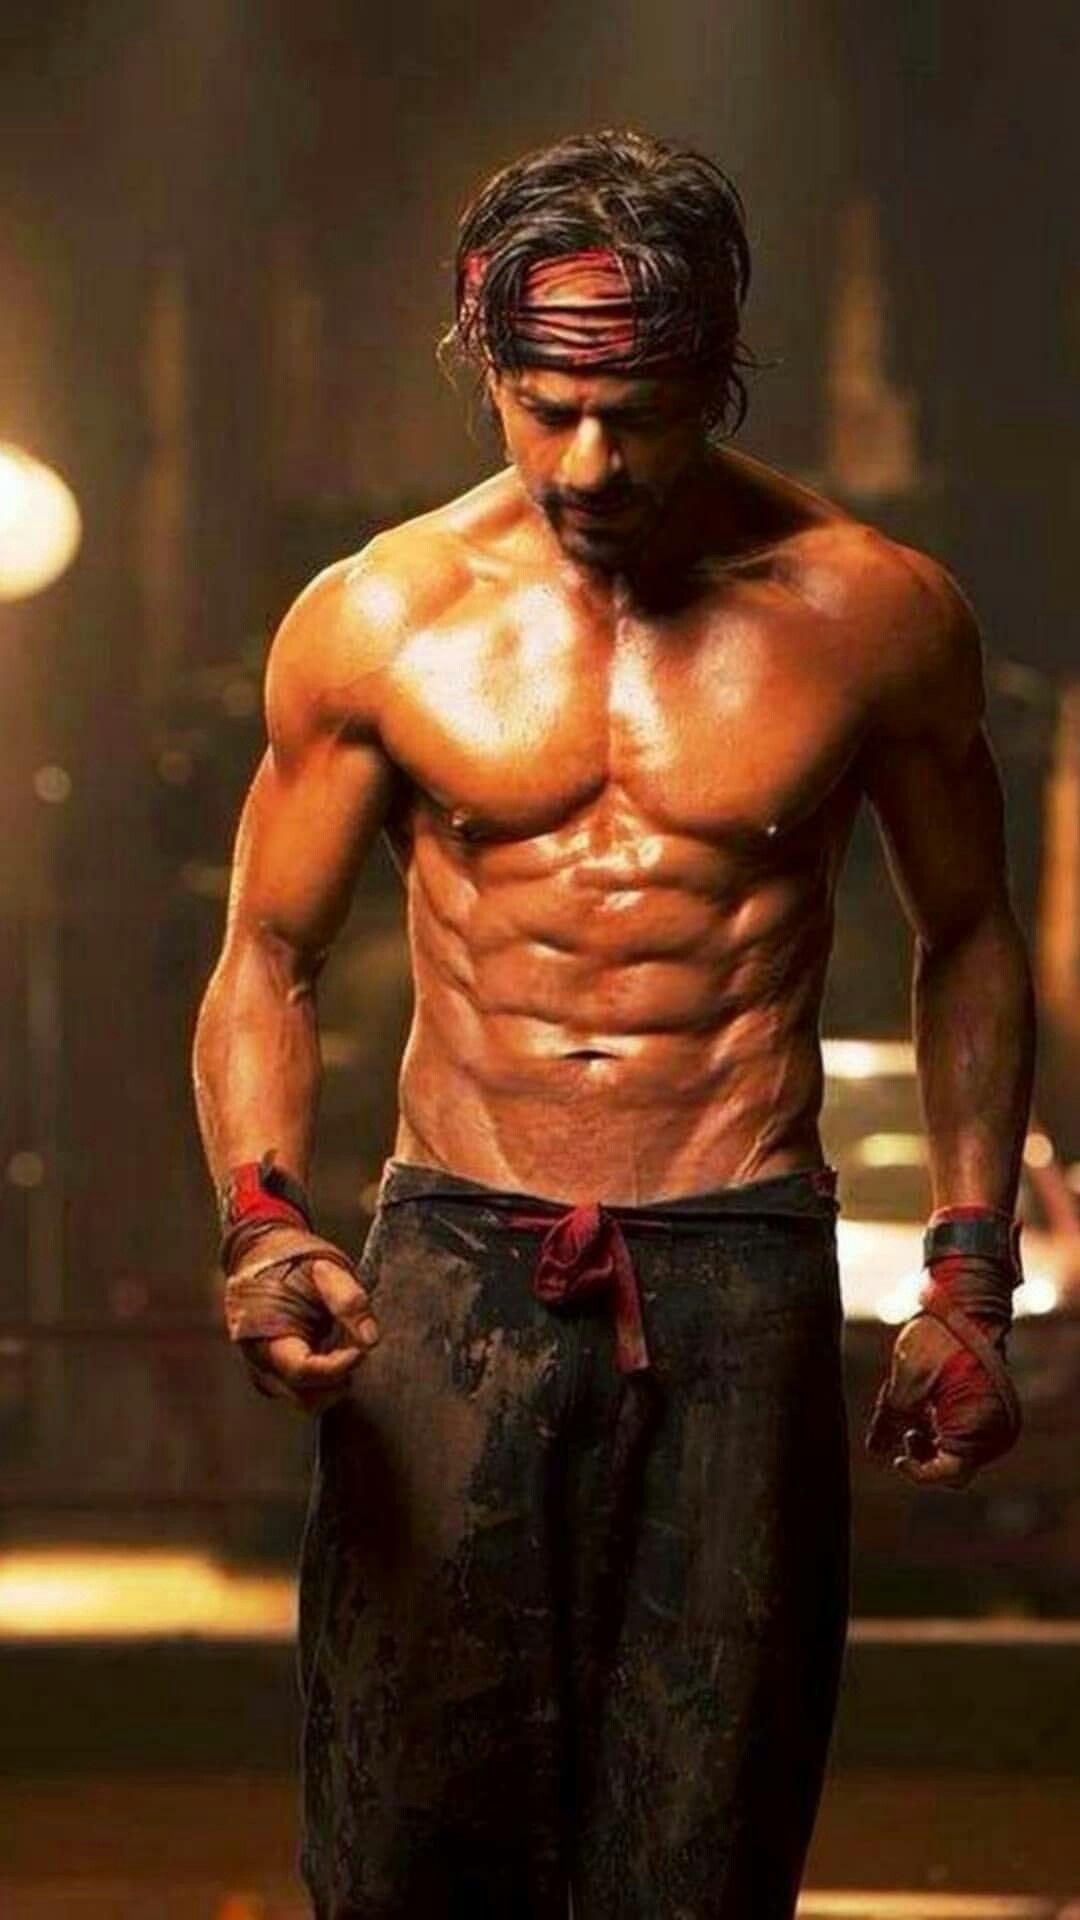 Pin By غ ــــدي ـــرシ On Shahrukh Khan In 2020 Shahrukh Khan Happy New Year Movie Khan